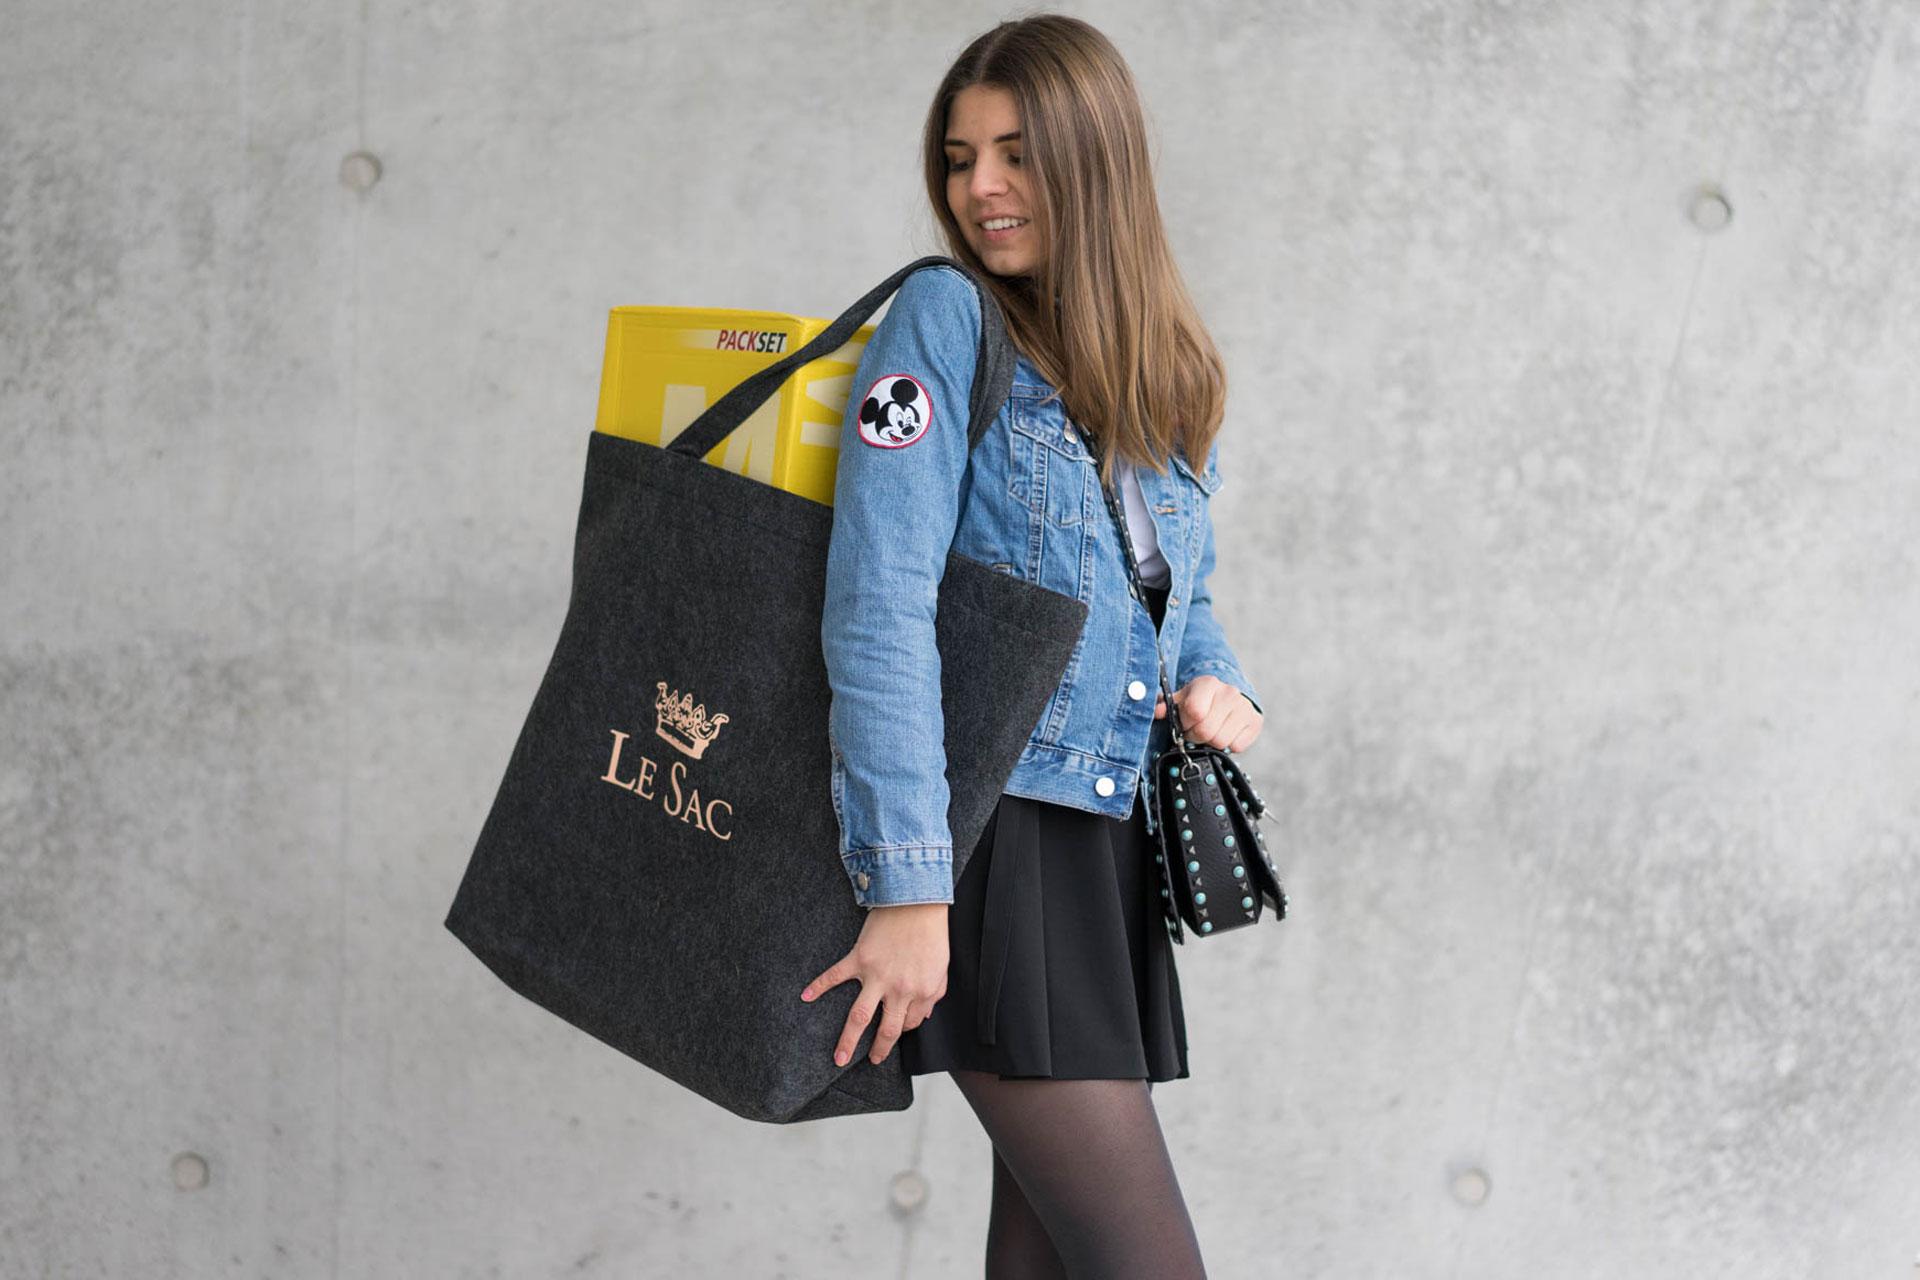 luxussachen-lesac-josi583d448a0caa3